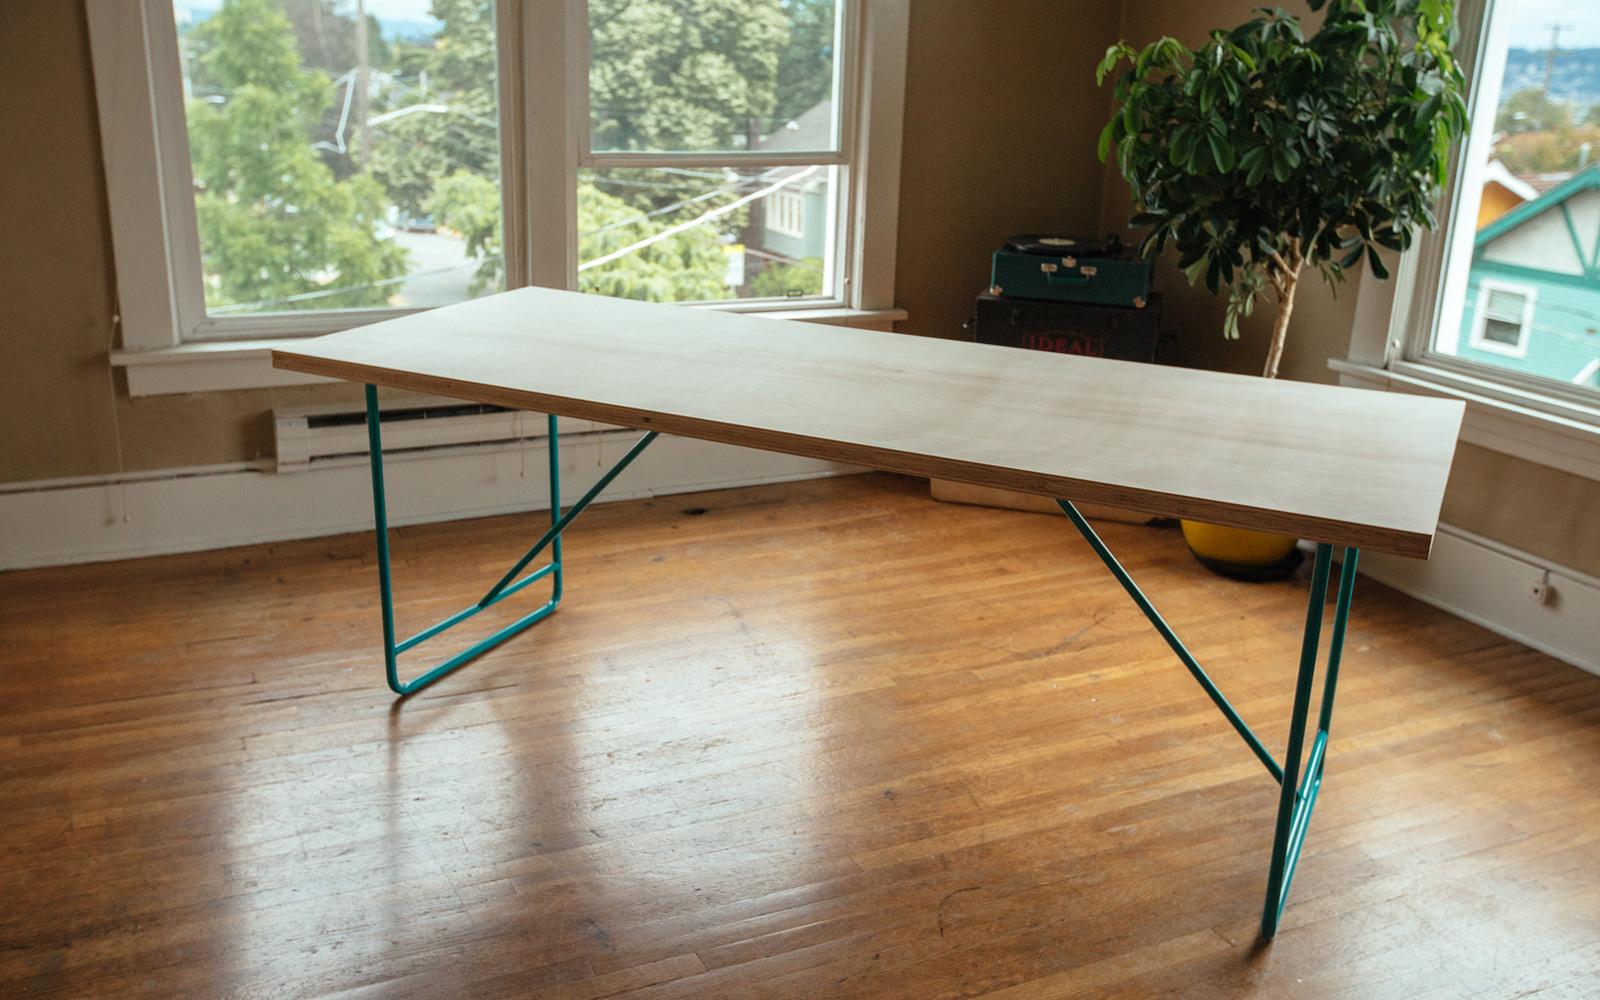 DIY โต๊ะอาหารสไตล์ Mid-century Modern